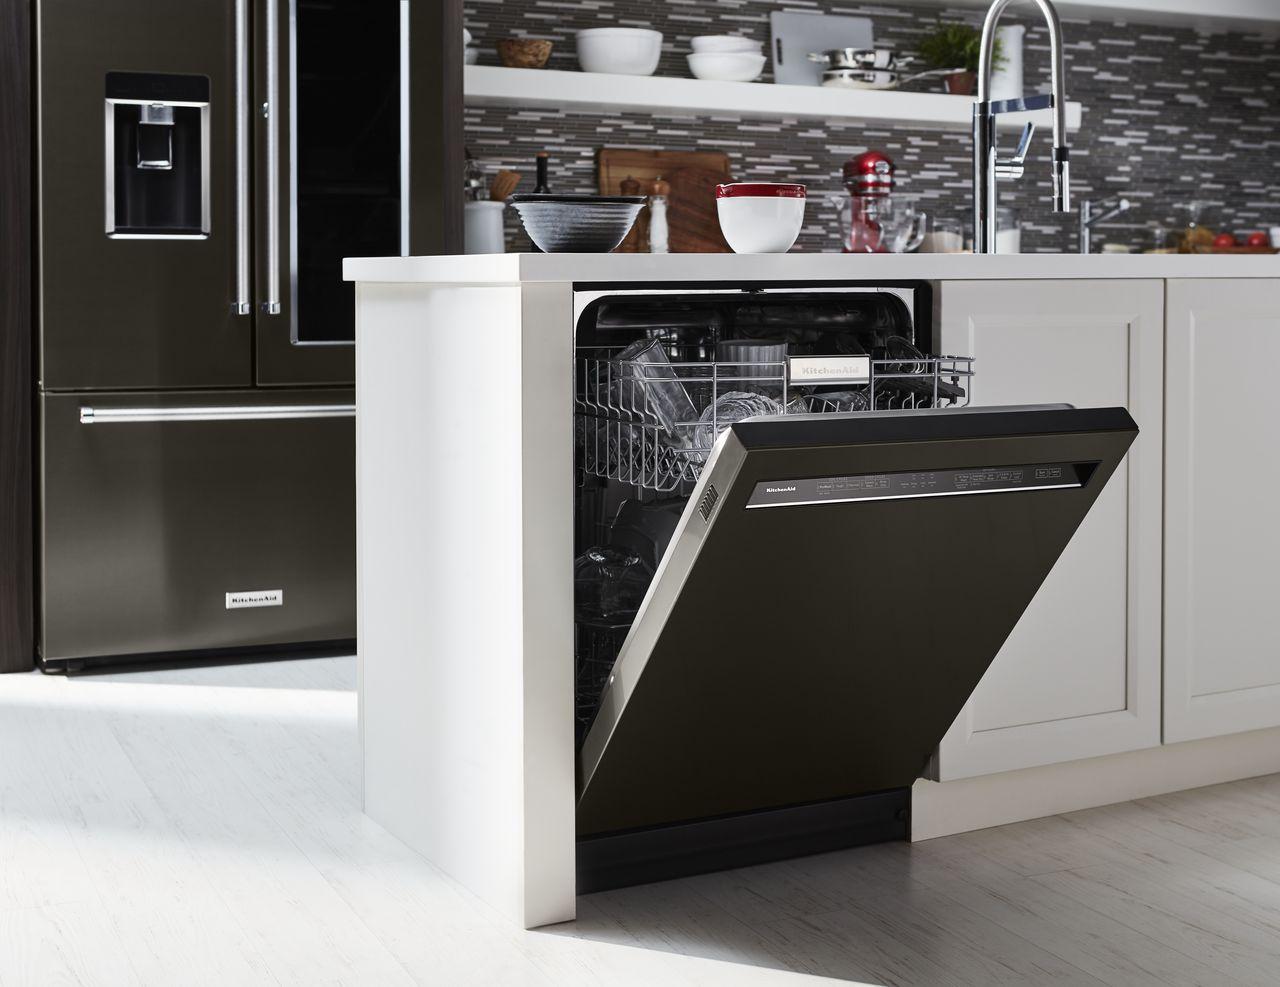 5 Ways To Clean Your KitchenAid Dishwasher